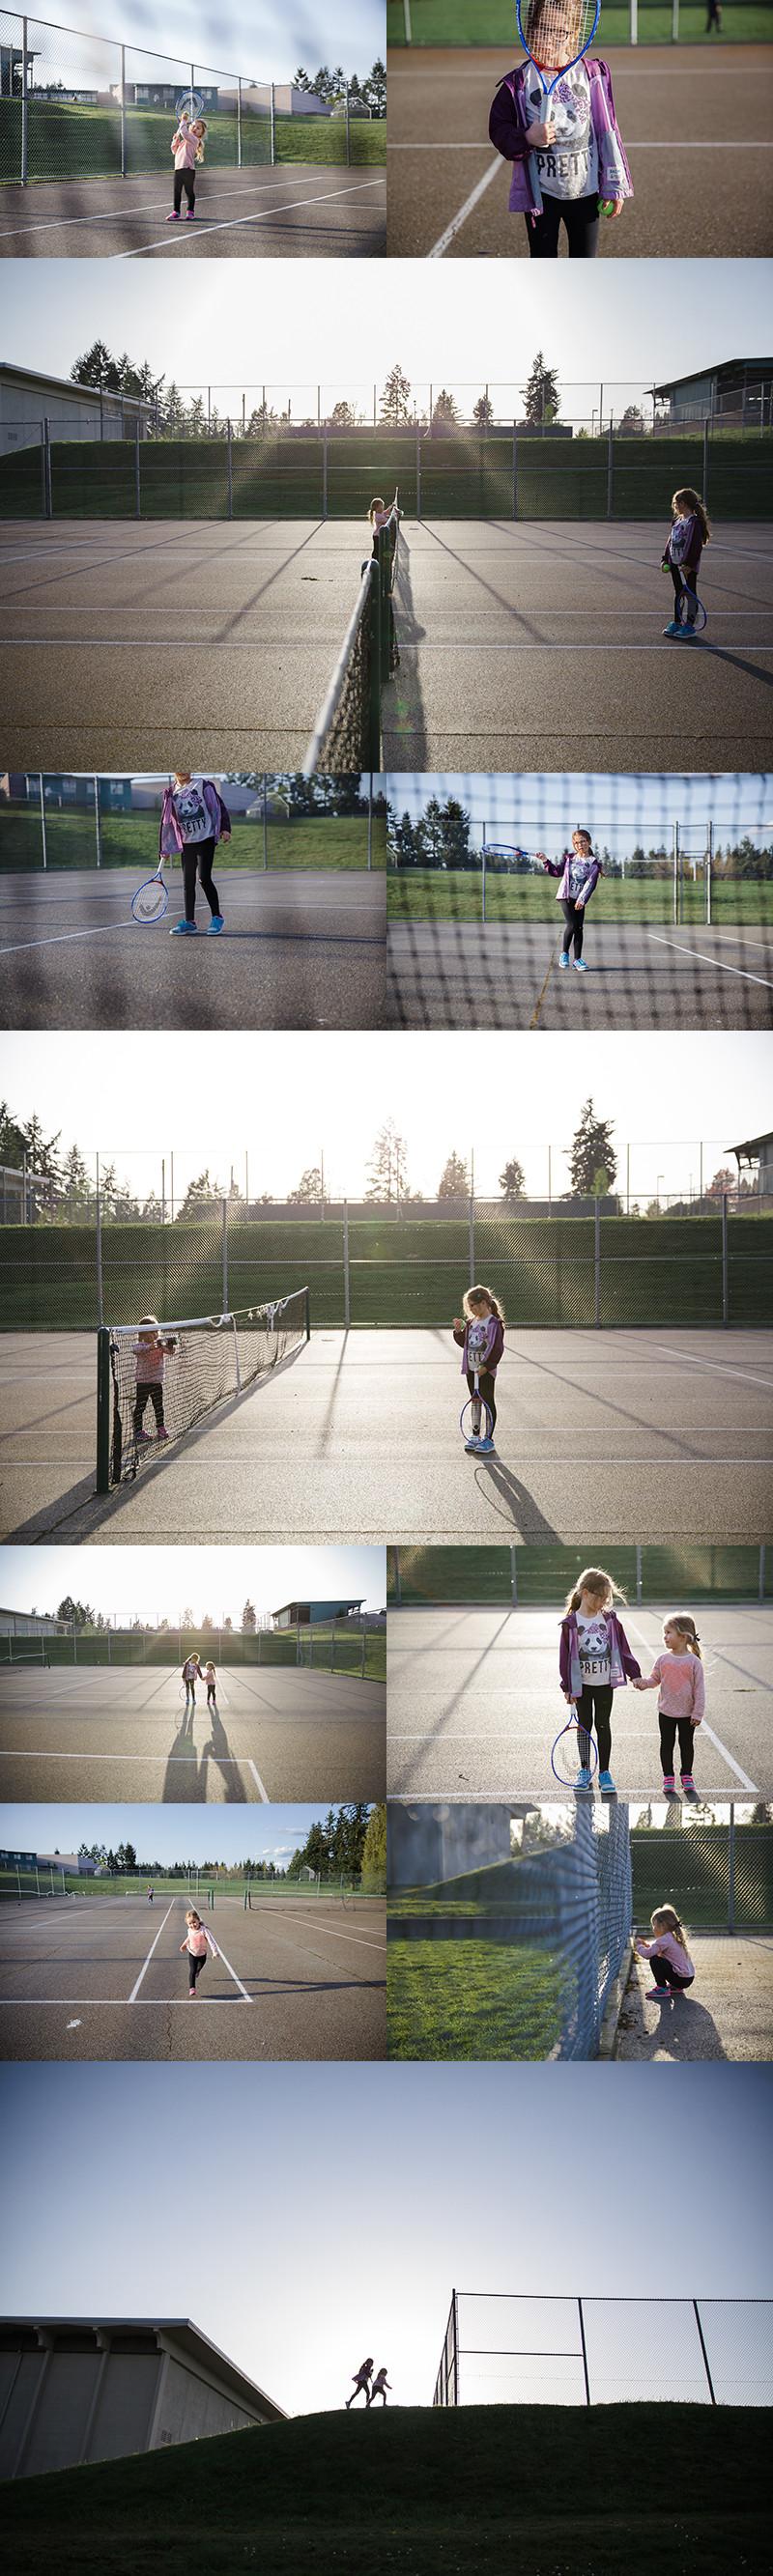 gphotoco_tennis.jpg